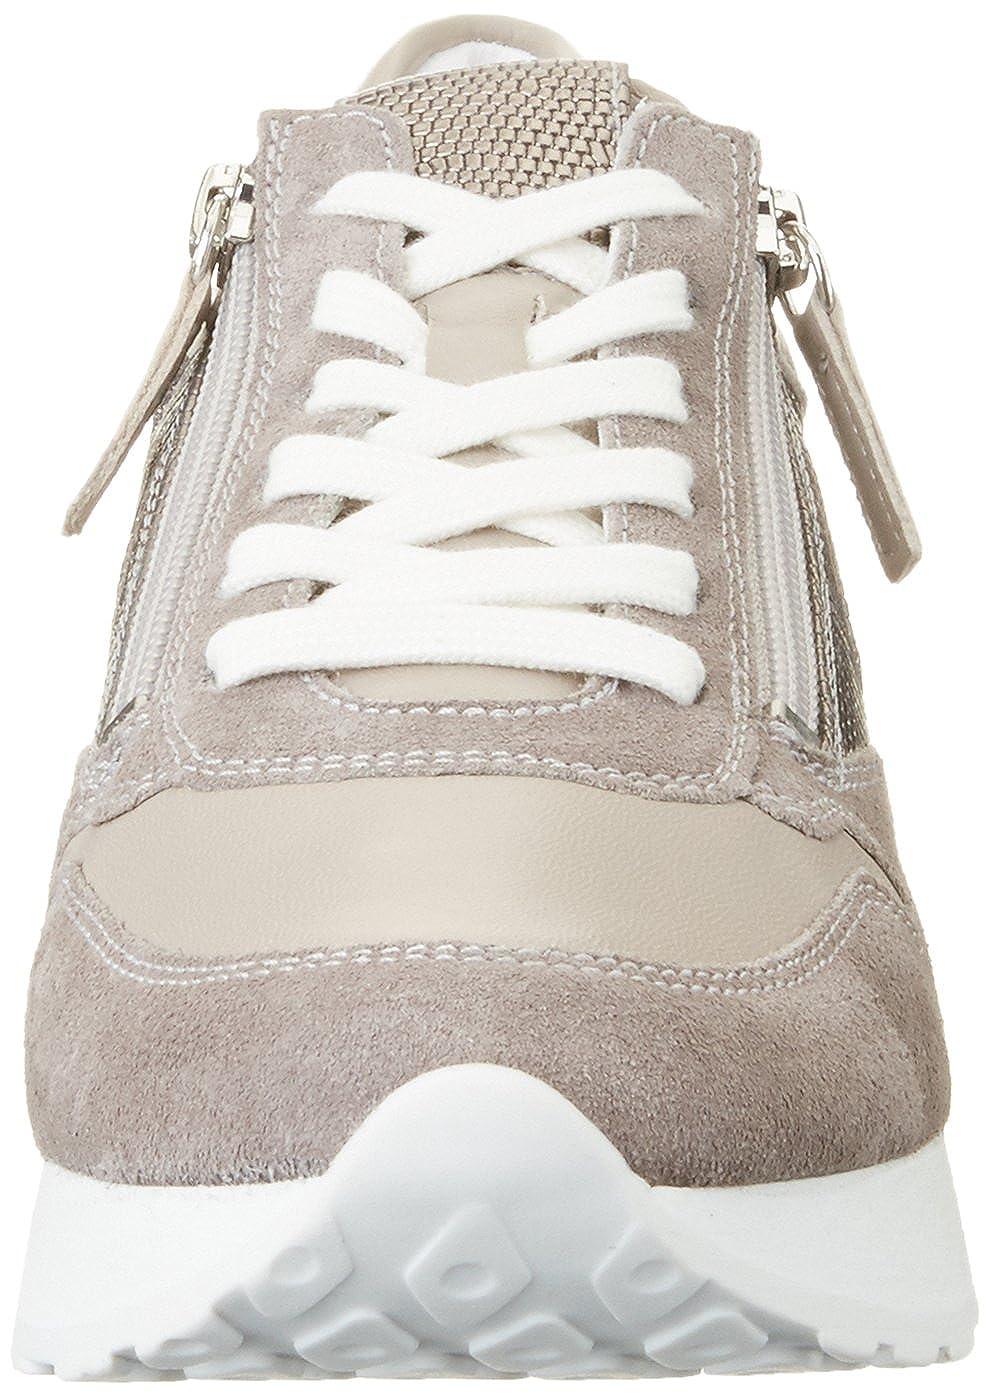 HÖGL Damen 3-10 1322 1322 3-10 6000 Sneakers Grau (Grau6000) b901ff